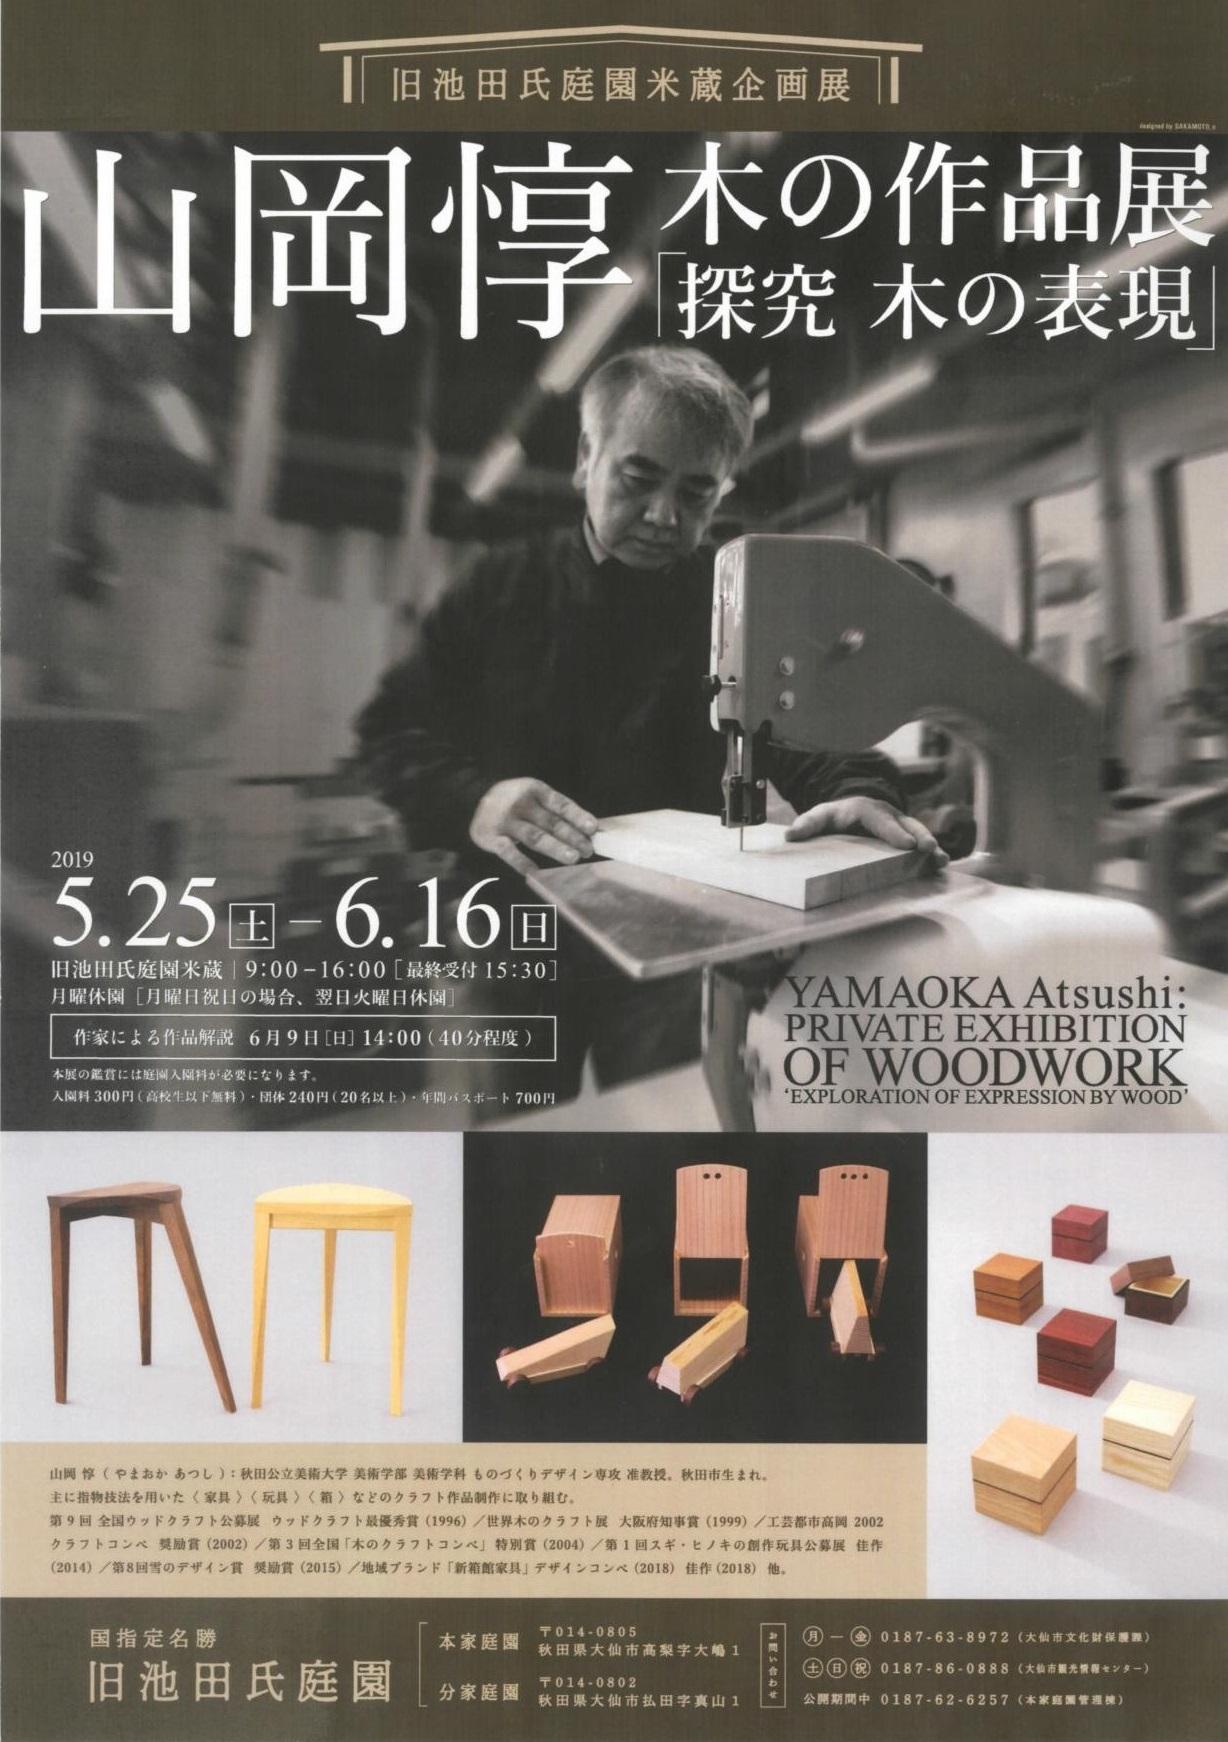 山岡惇 木の作品展「探究 木の表現」開催